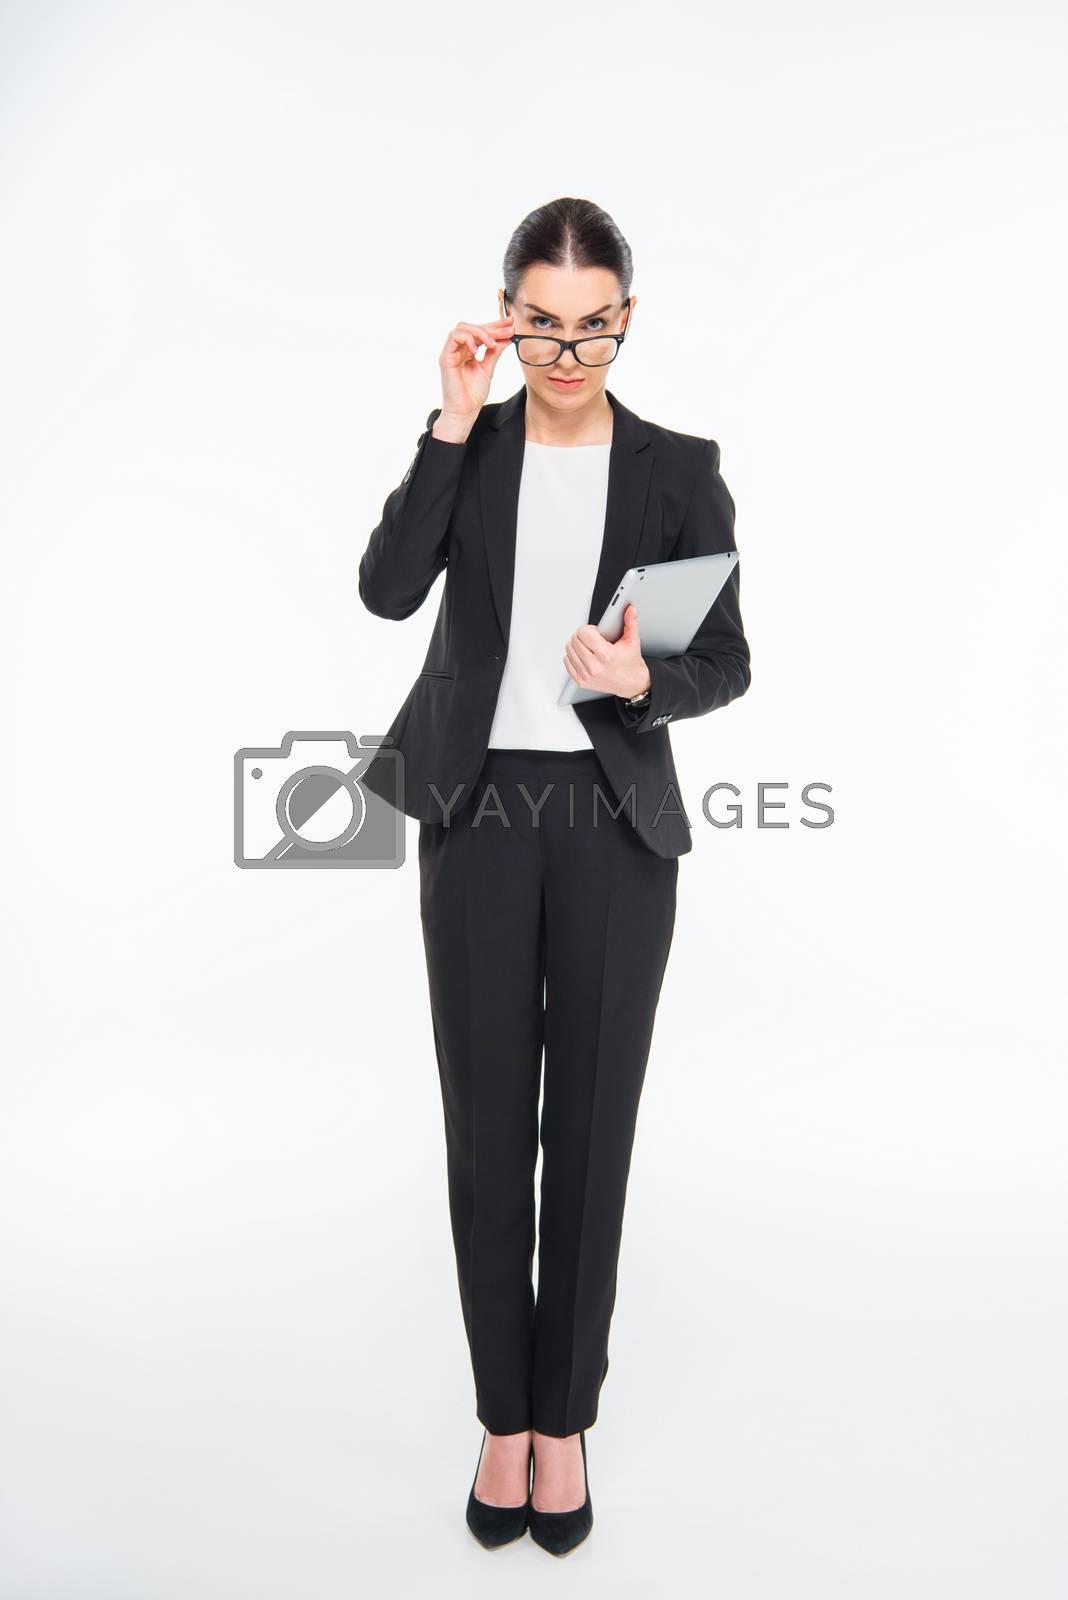 Royalty free image of Businesswoman holding digital tablet by LightFieldStudios